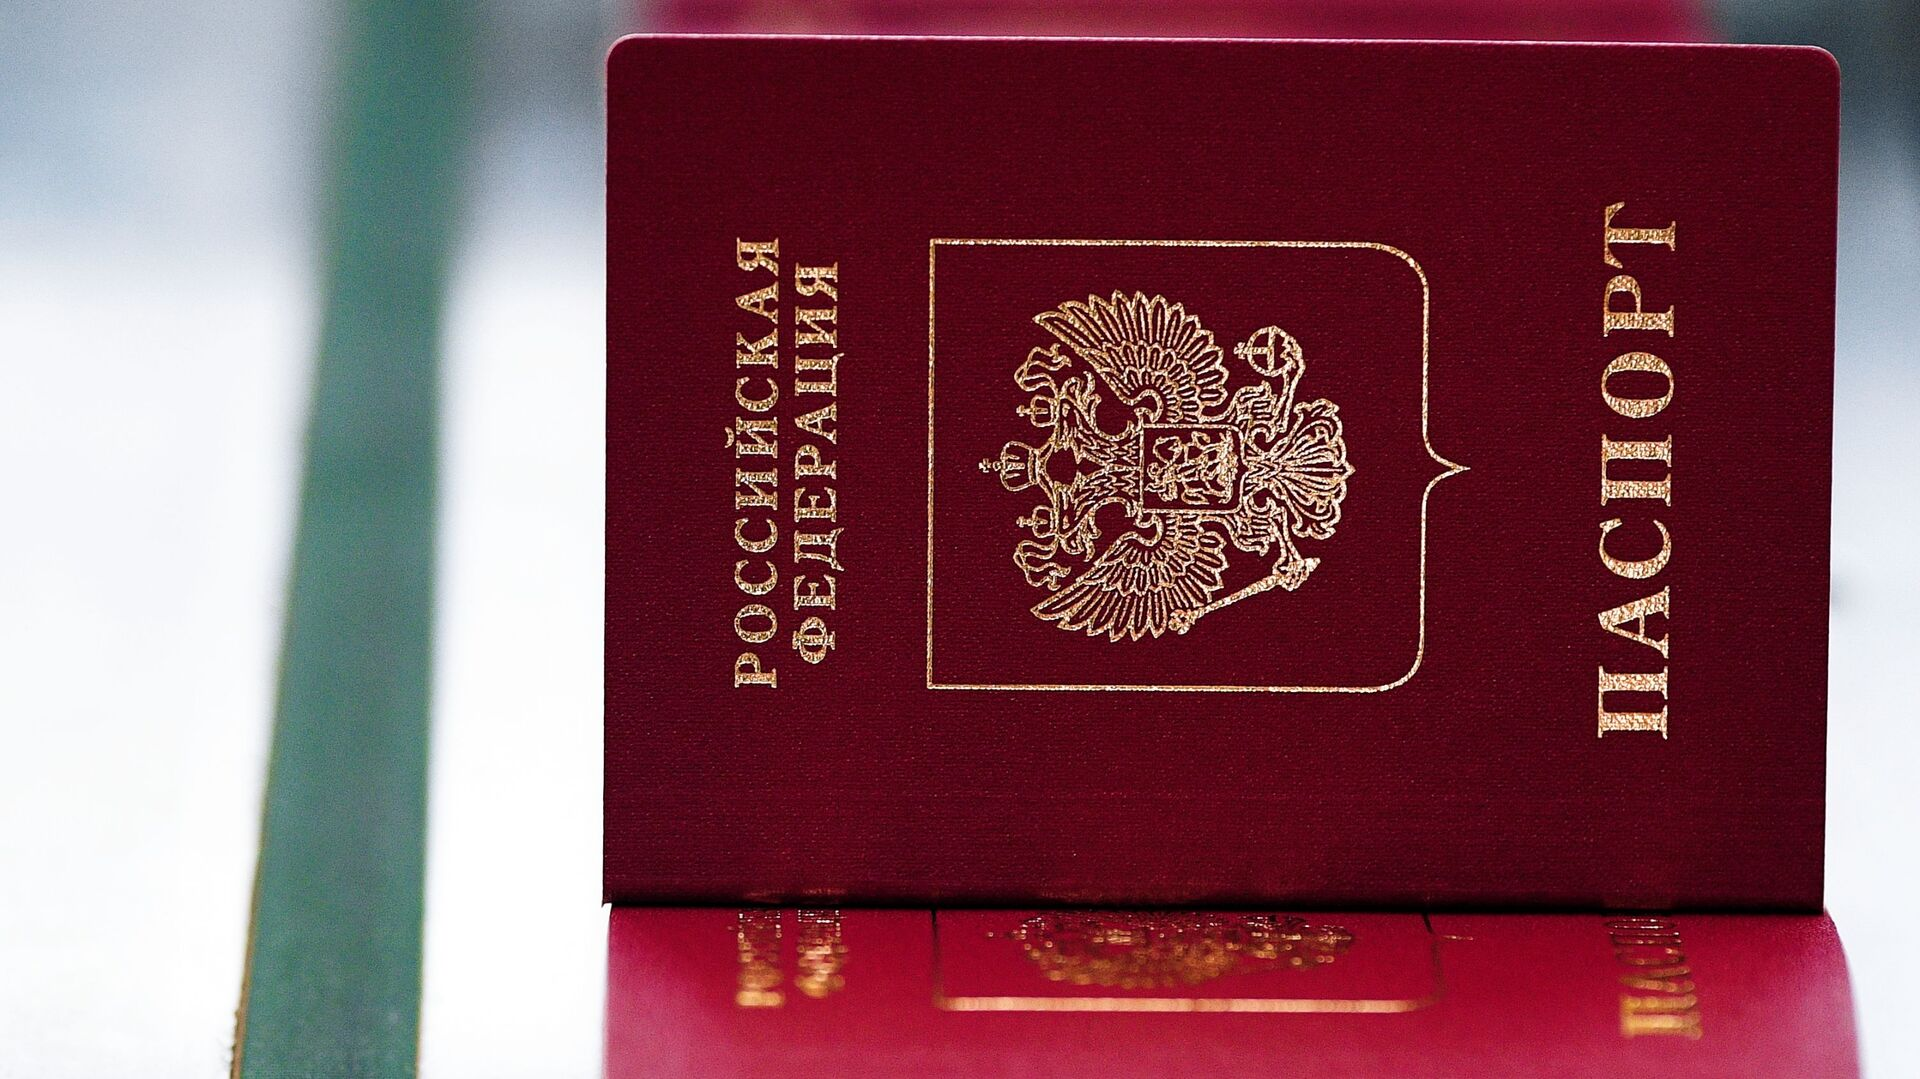 Producción de pasaportes rusos - Sputnik Mundo, 1920, 09.10.2021